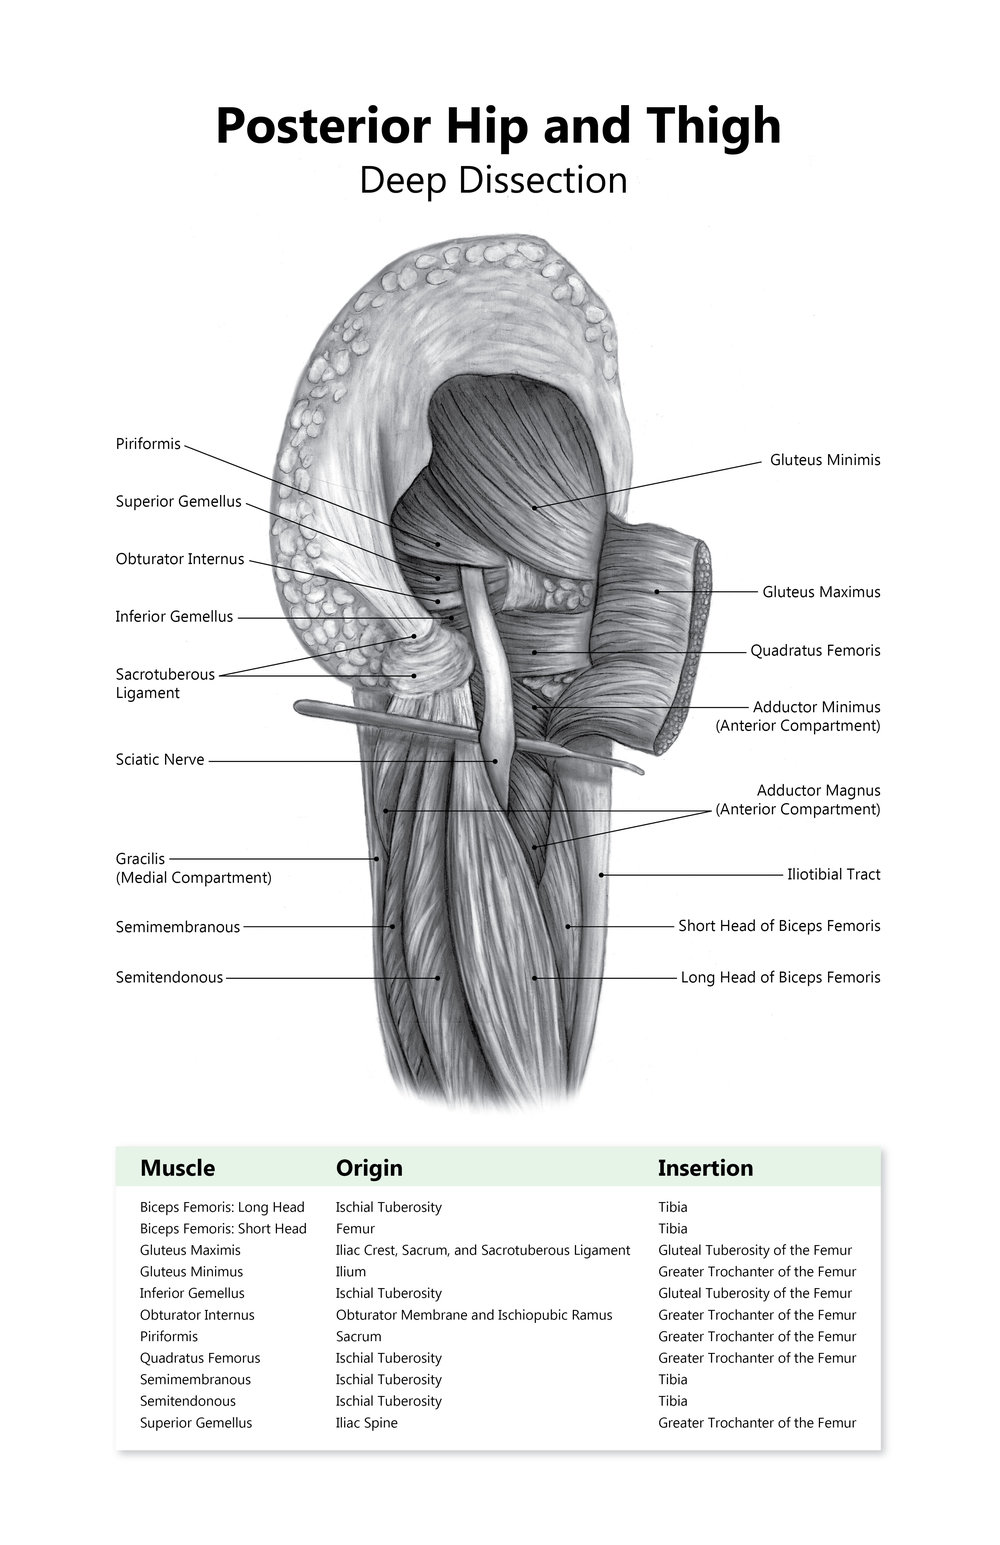 posteriorHip.jpg